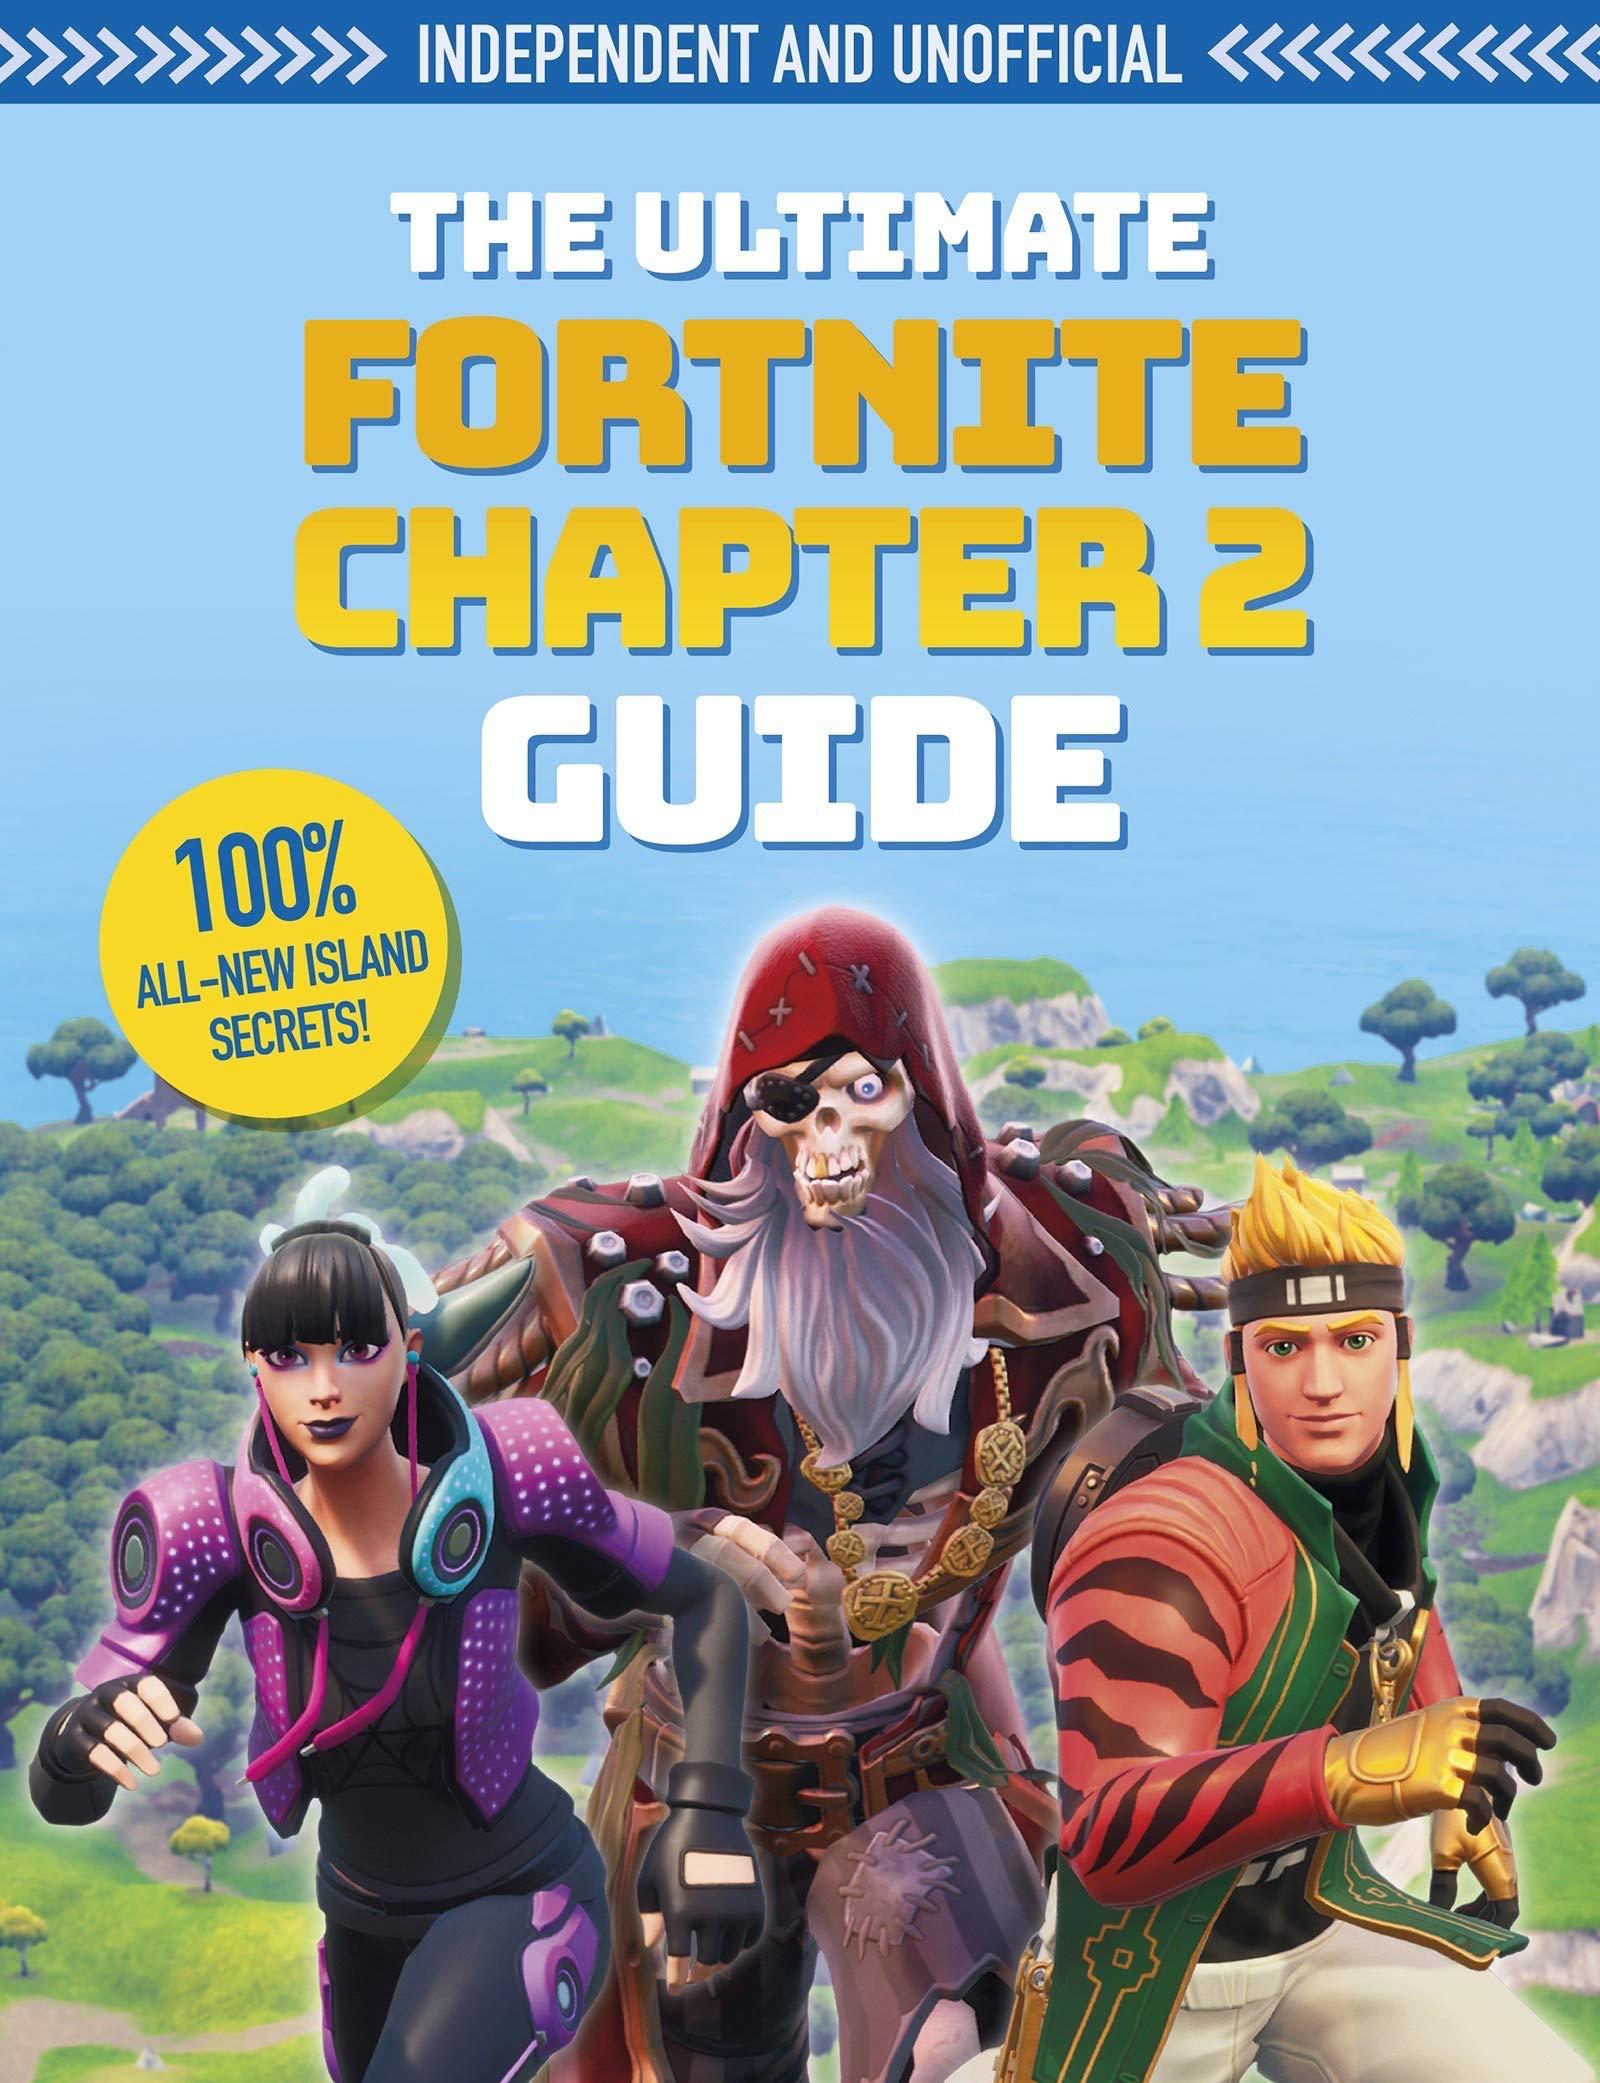 2 4k Fortnite Emotes Roblox The Ultimate Fortnite Chapter 2 Guide Pettman Kevin 9781839350009 Amazon Com Books